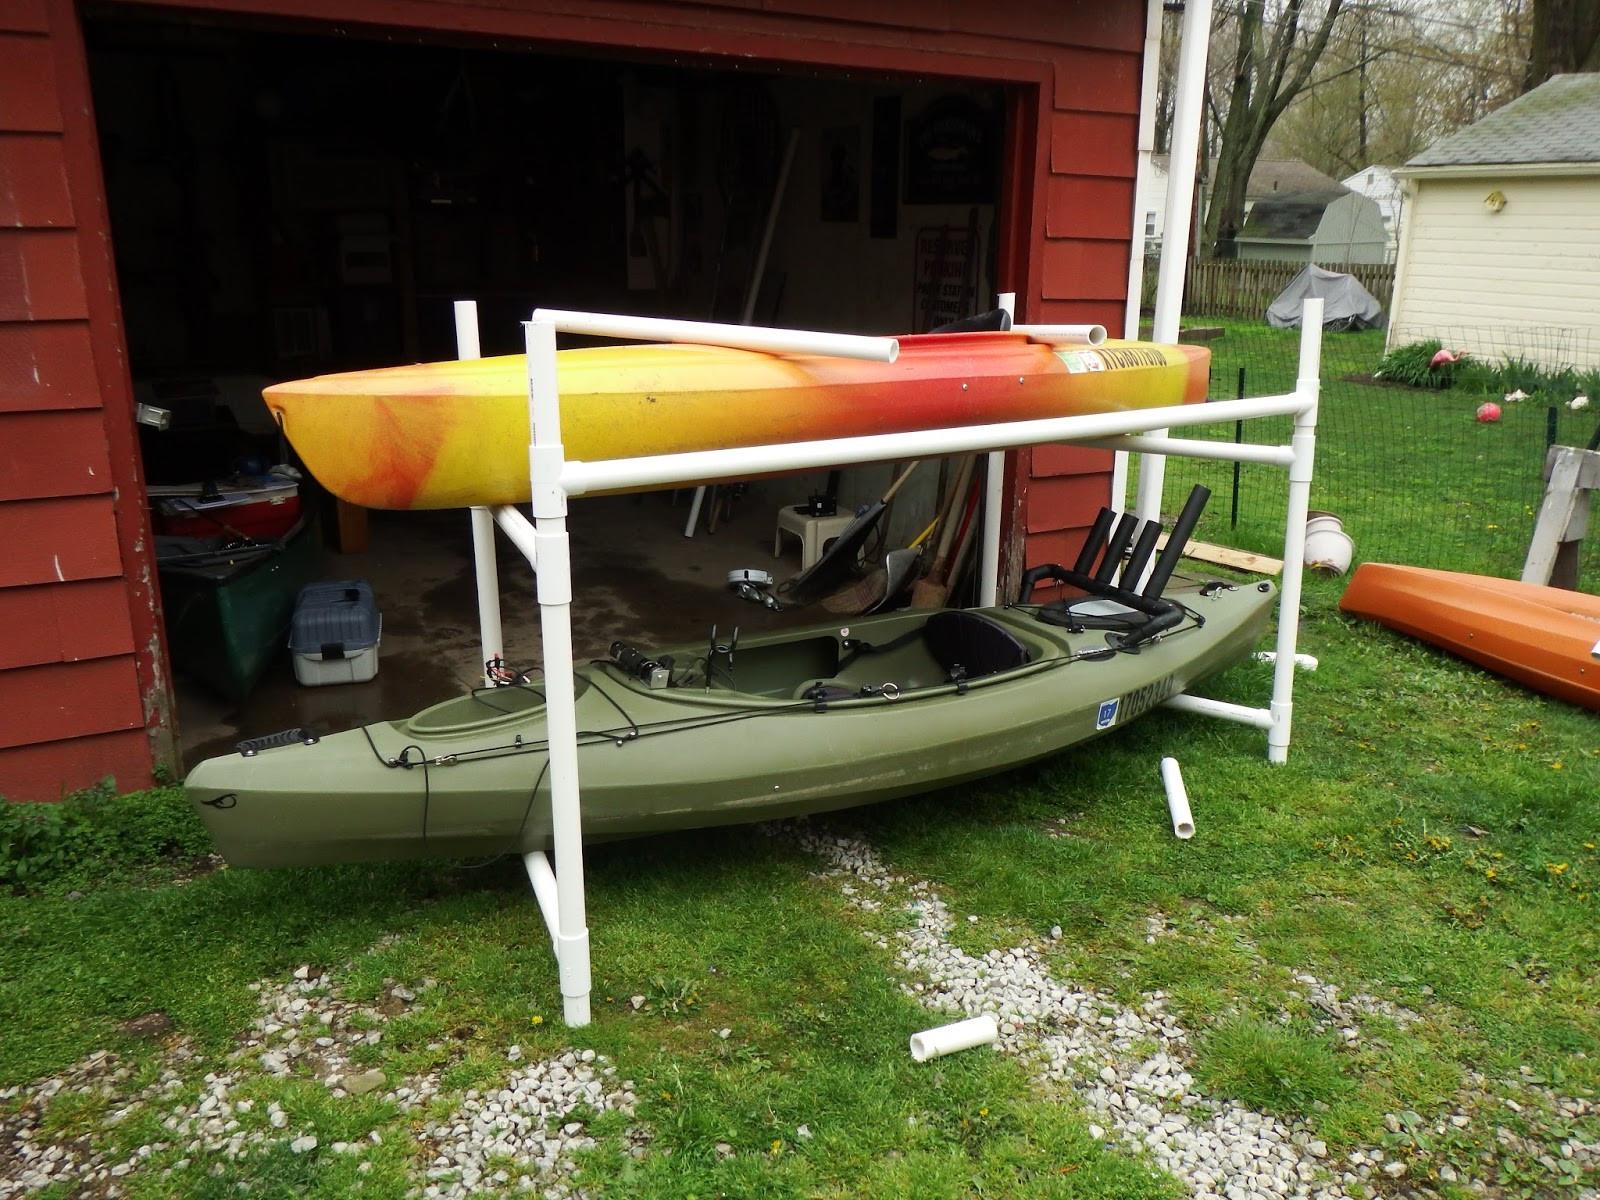 DIY Kayak Rack Pvc  The Northern Spike DIY Kayak Storage Rack